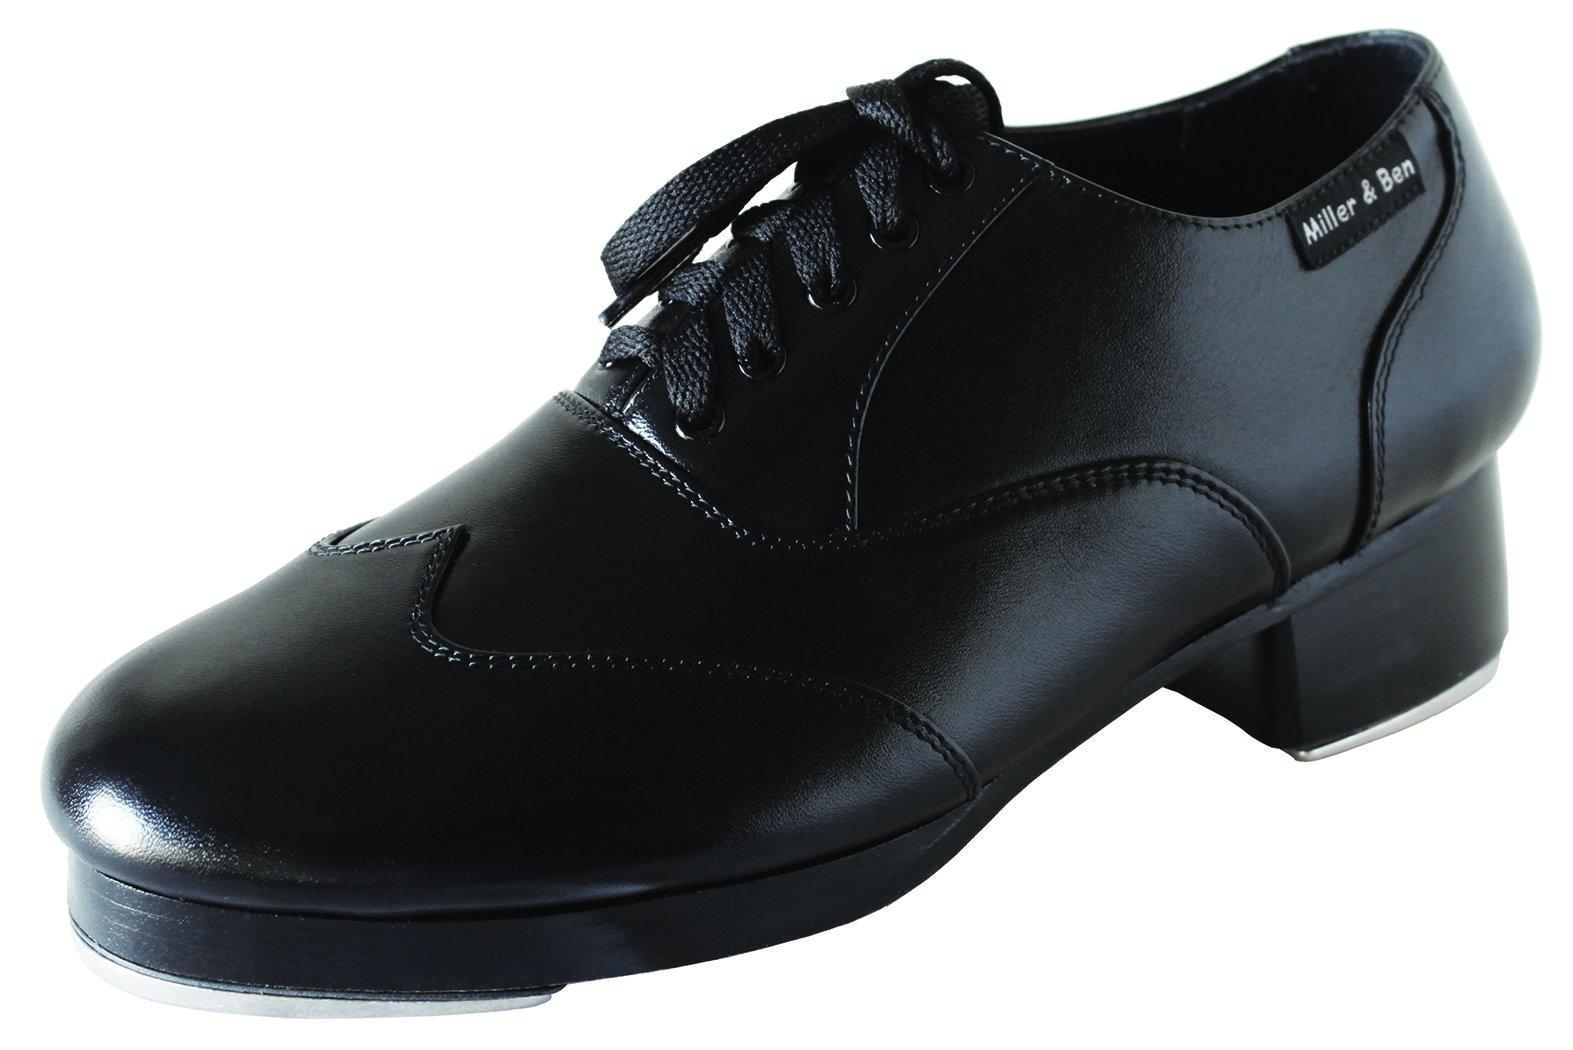 Miller & Ben Tap Shoes; Triple Threat; All Black - Standard Sizes ONLY (37 - Regular) by Miller & Ben